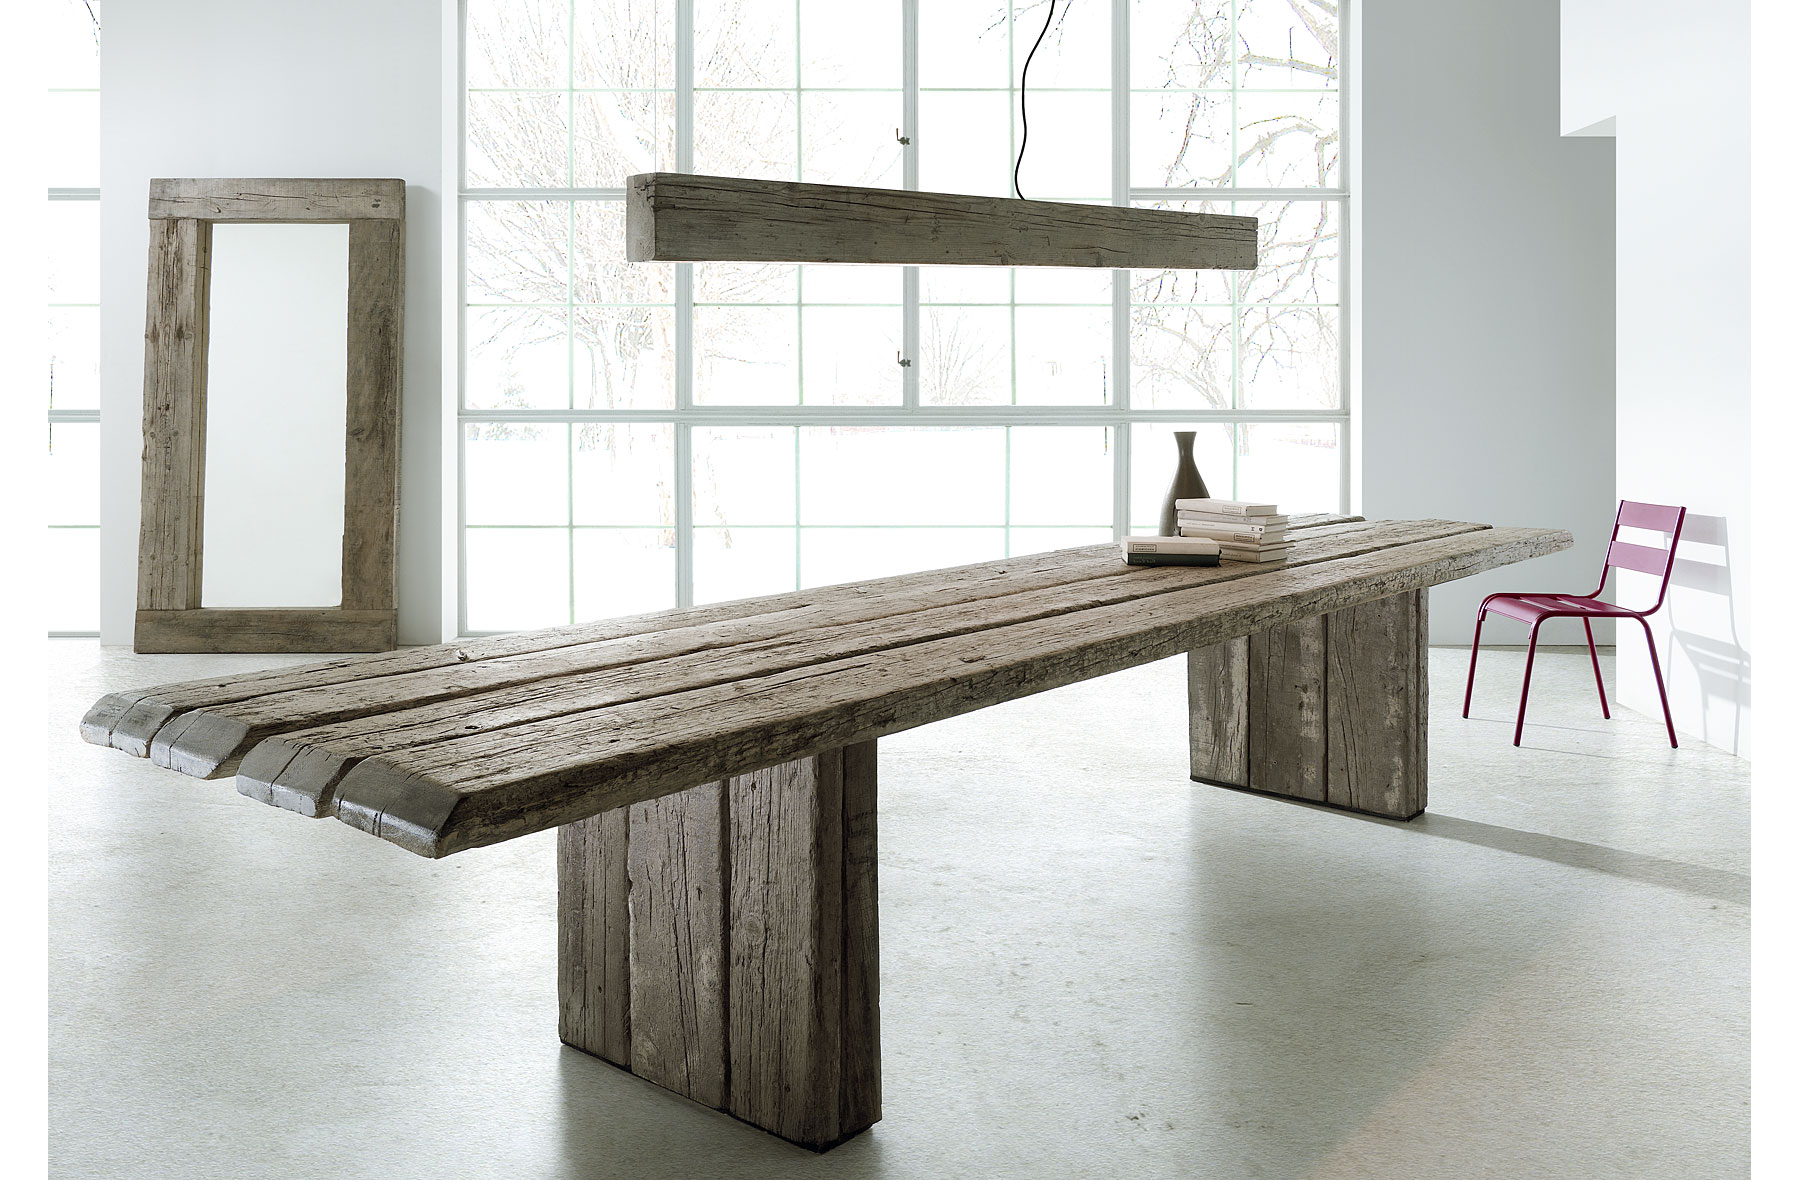 Mesa de comedor Oregón madera centenaria en Portobellostreet.es